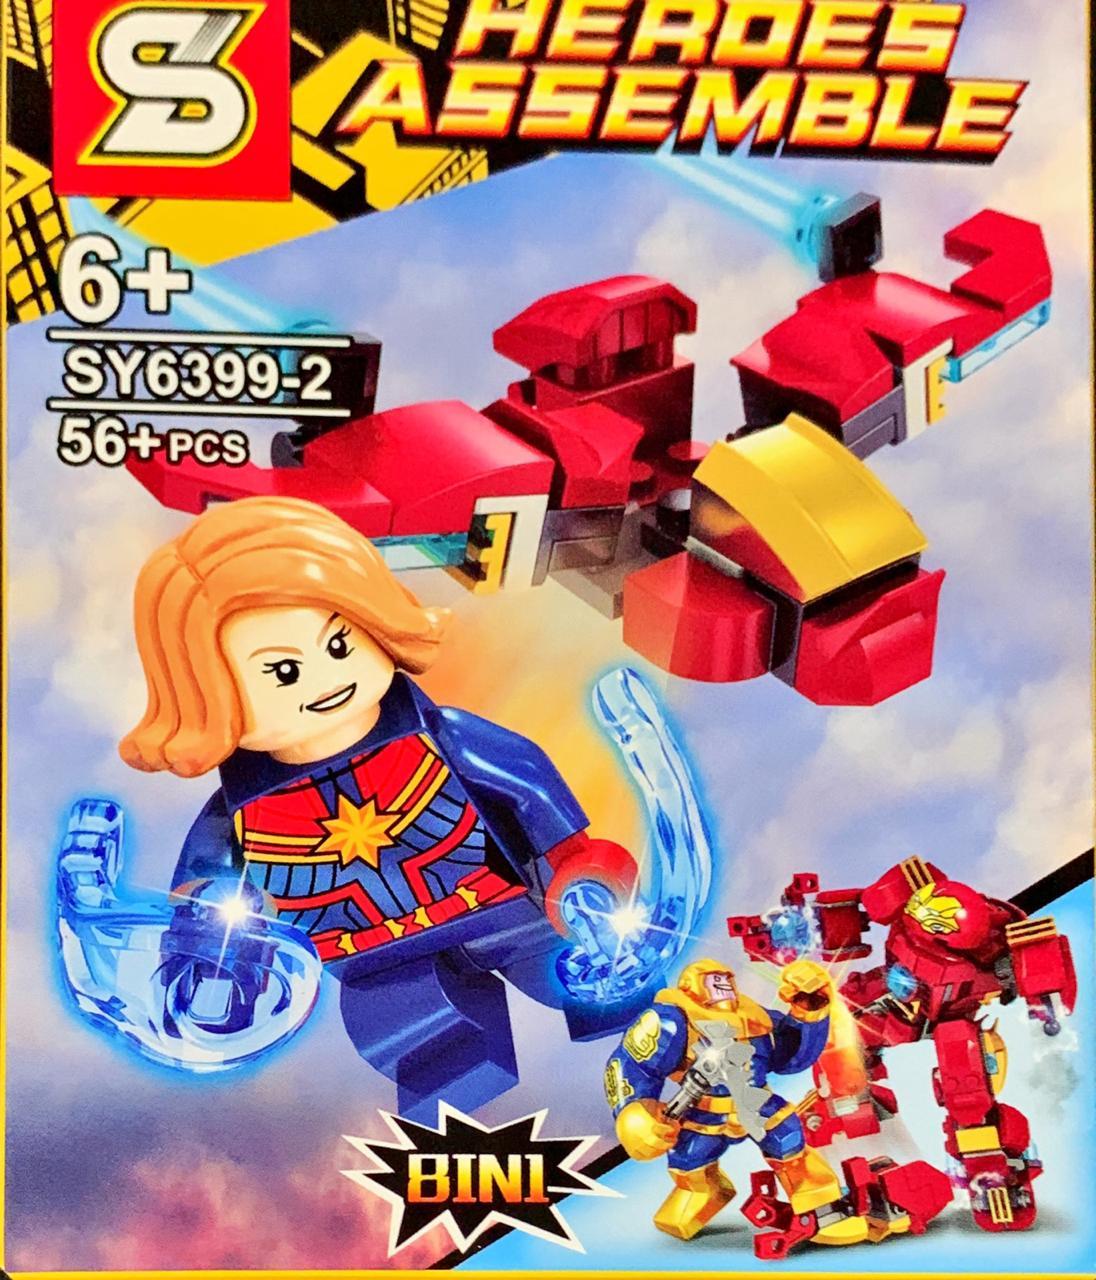 Bloco de Montar Heroes Assemble: Capitã Marvel (SY6399-2) - (56 Peças)